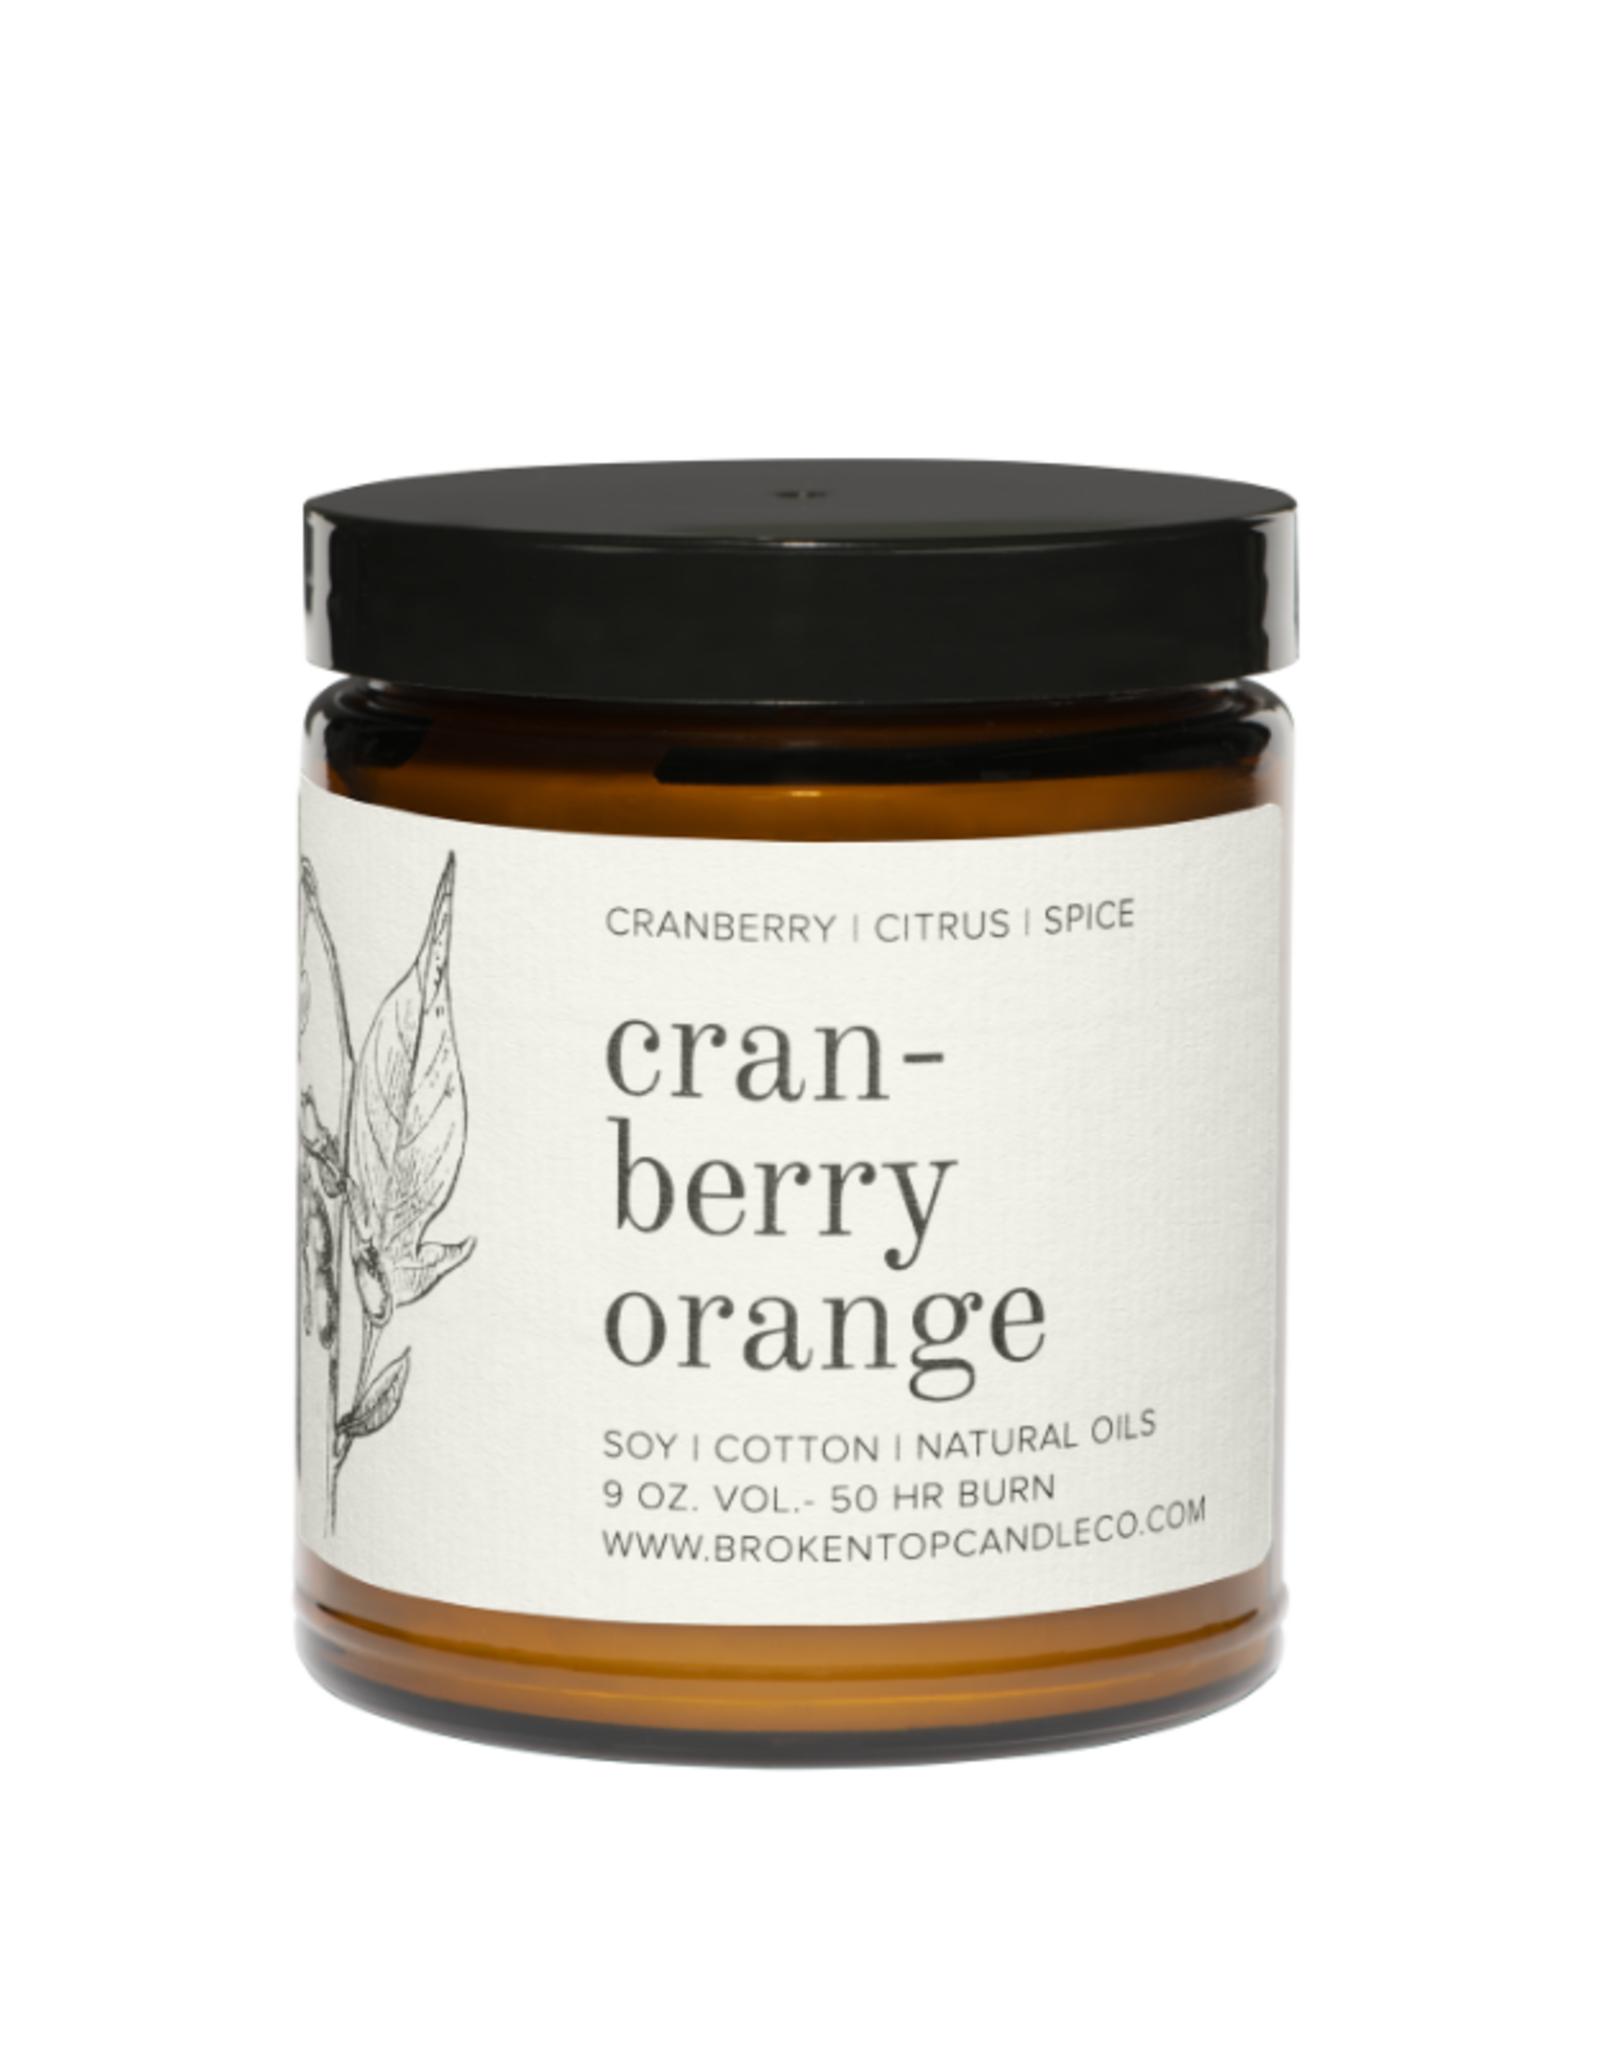 Broken Top Candle Bougie - Cranberry orange - 50h